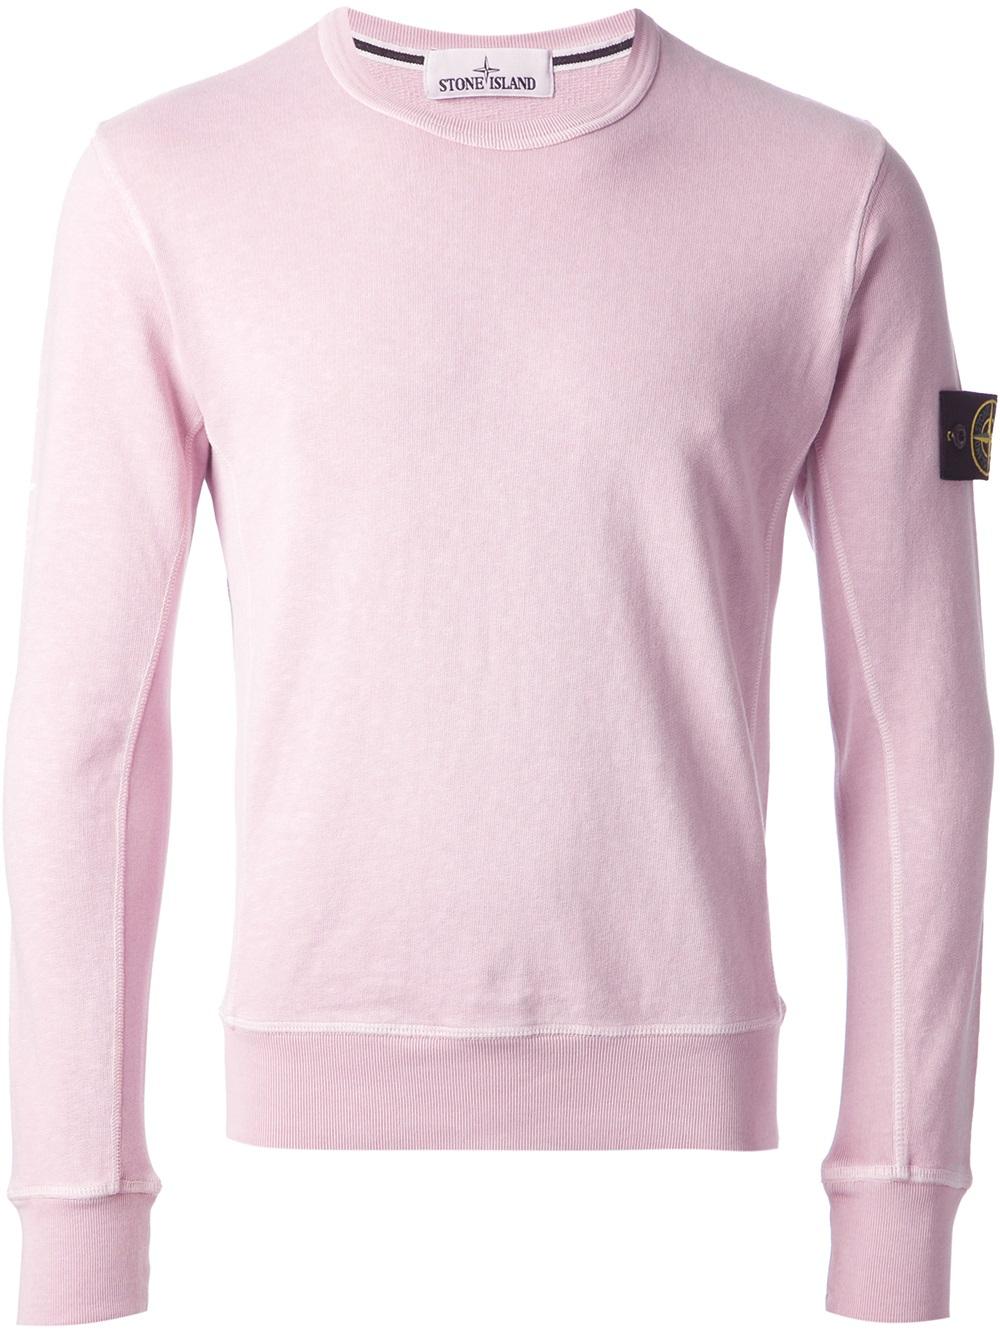 05dc432f Stone Island Logo Patch Sweatshirt in Pink for Men - Lyst